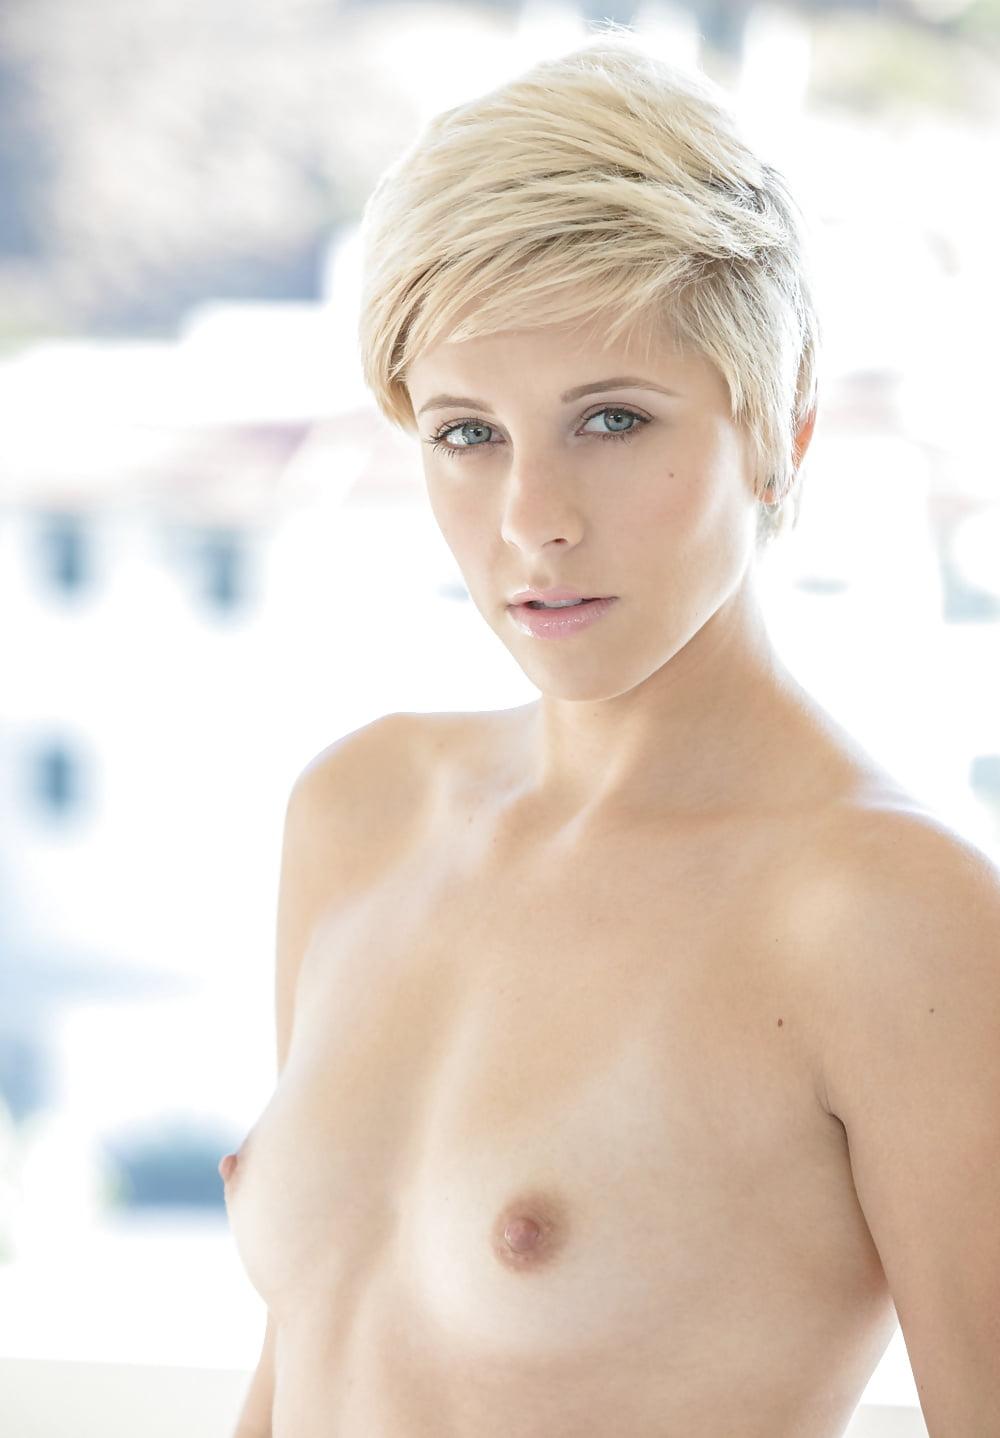 pornstar-with-short-hair-gallery